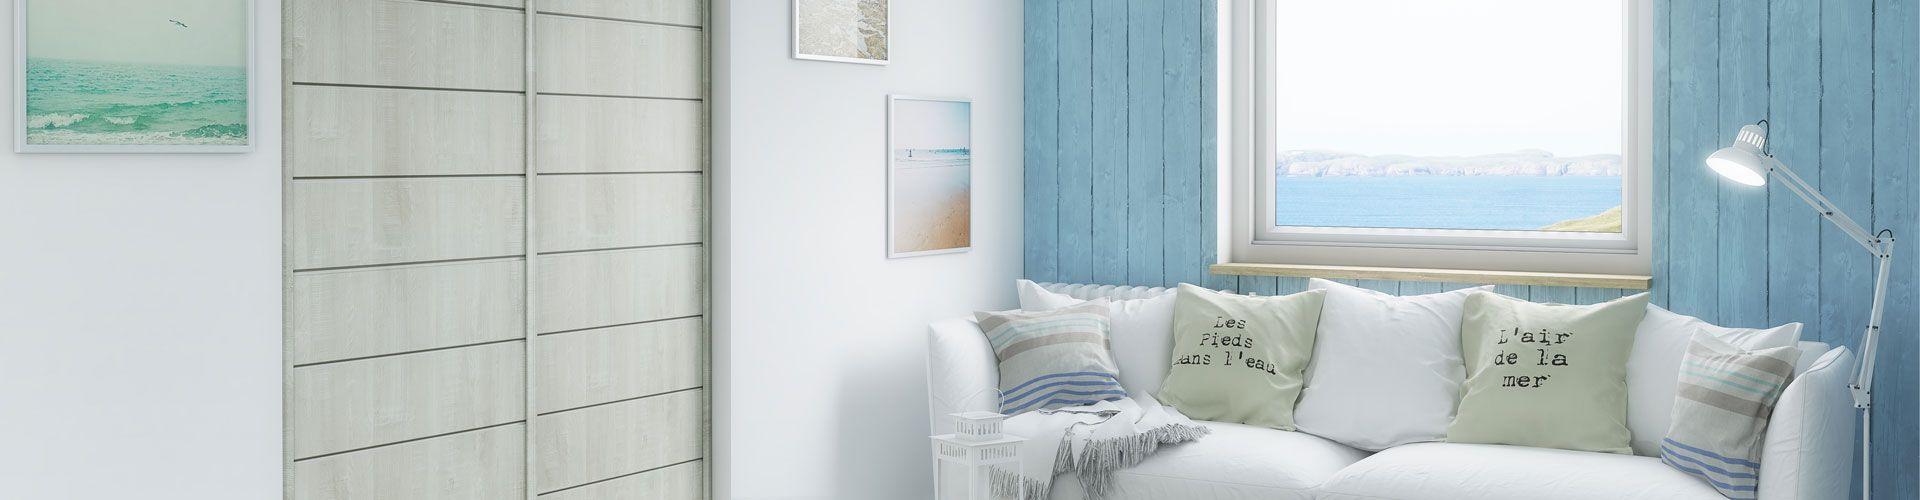 portes de placard coulissante biarritz kazed. Black Bedroom Furniture Sets. Home Design Ideas